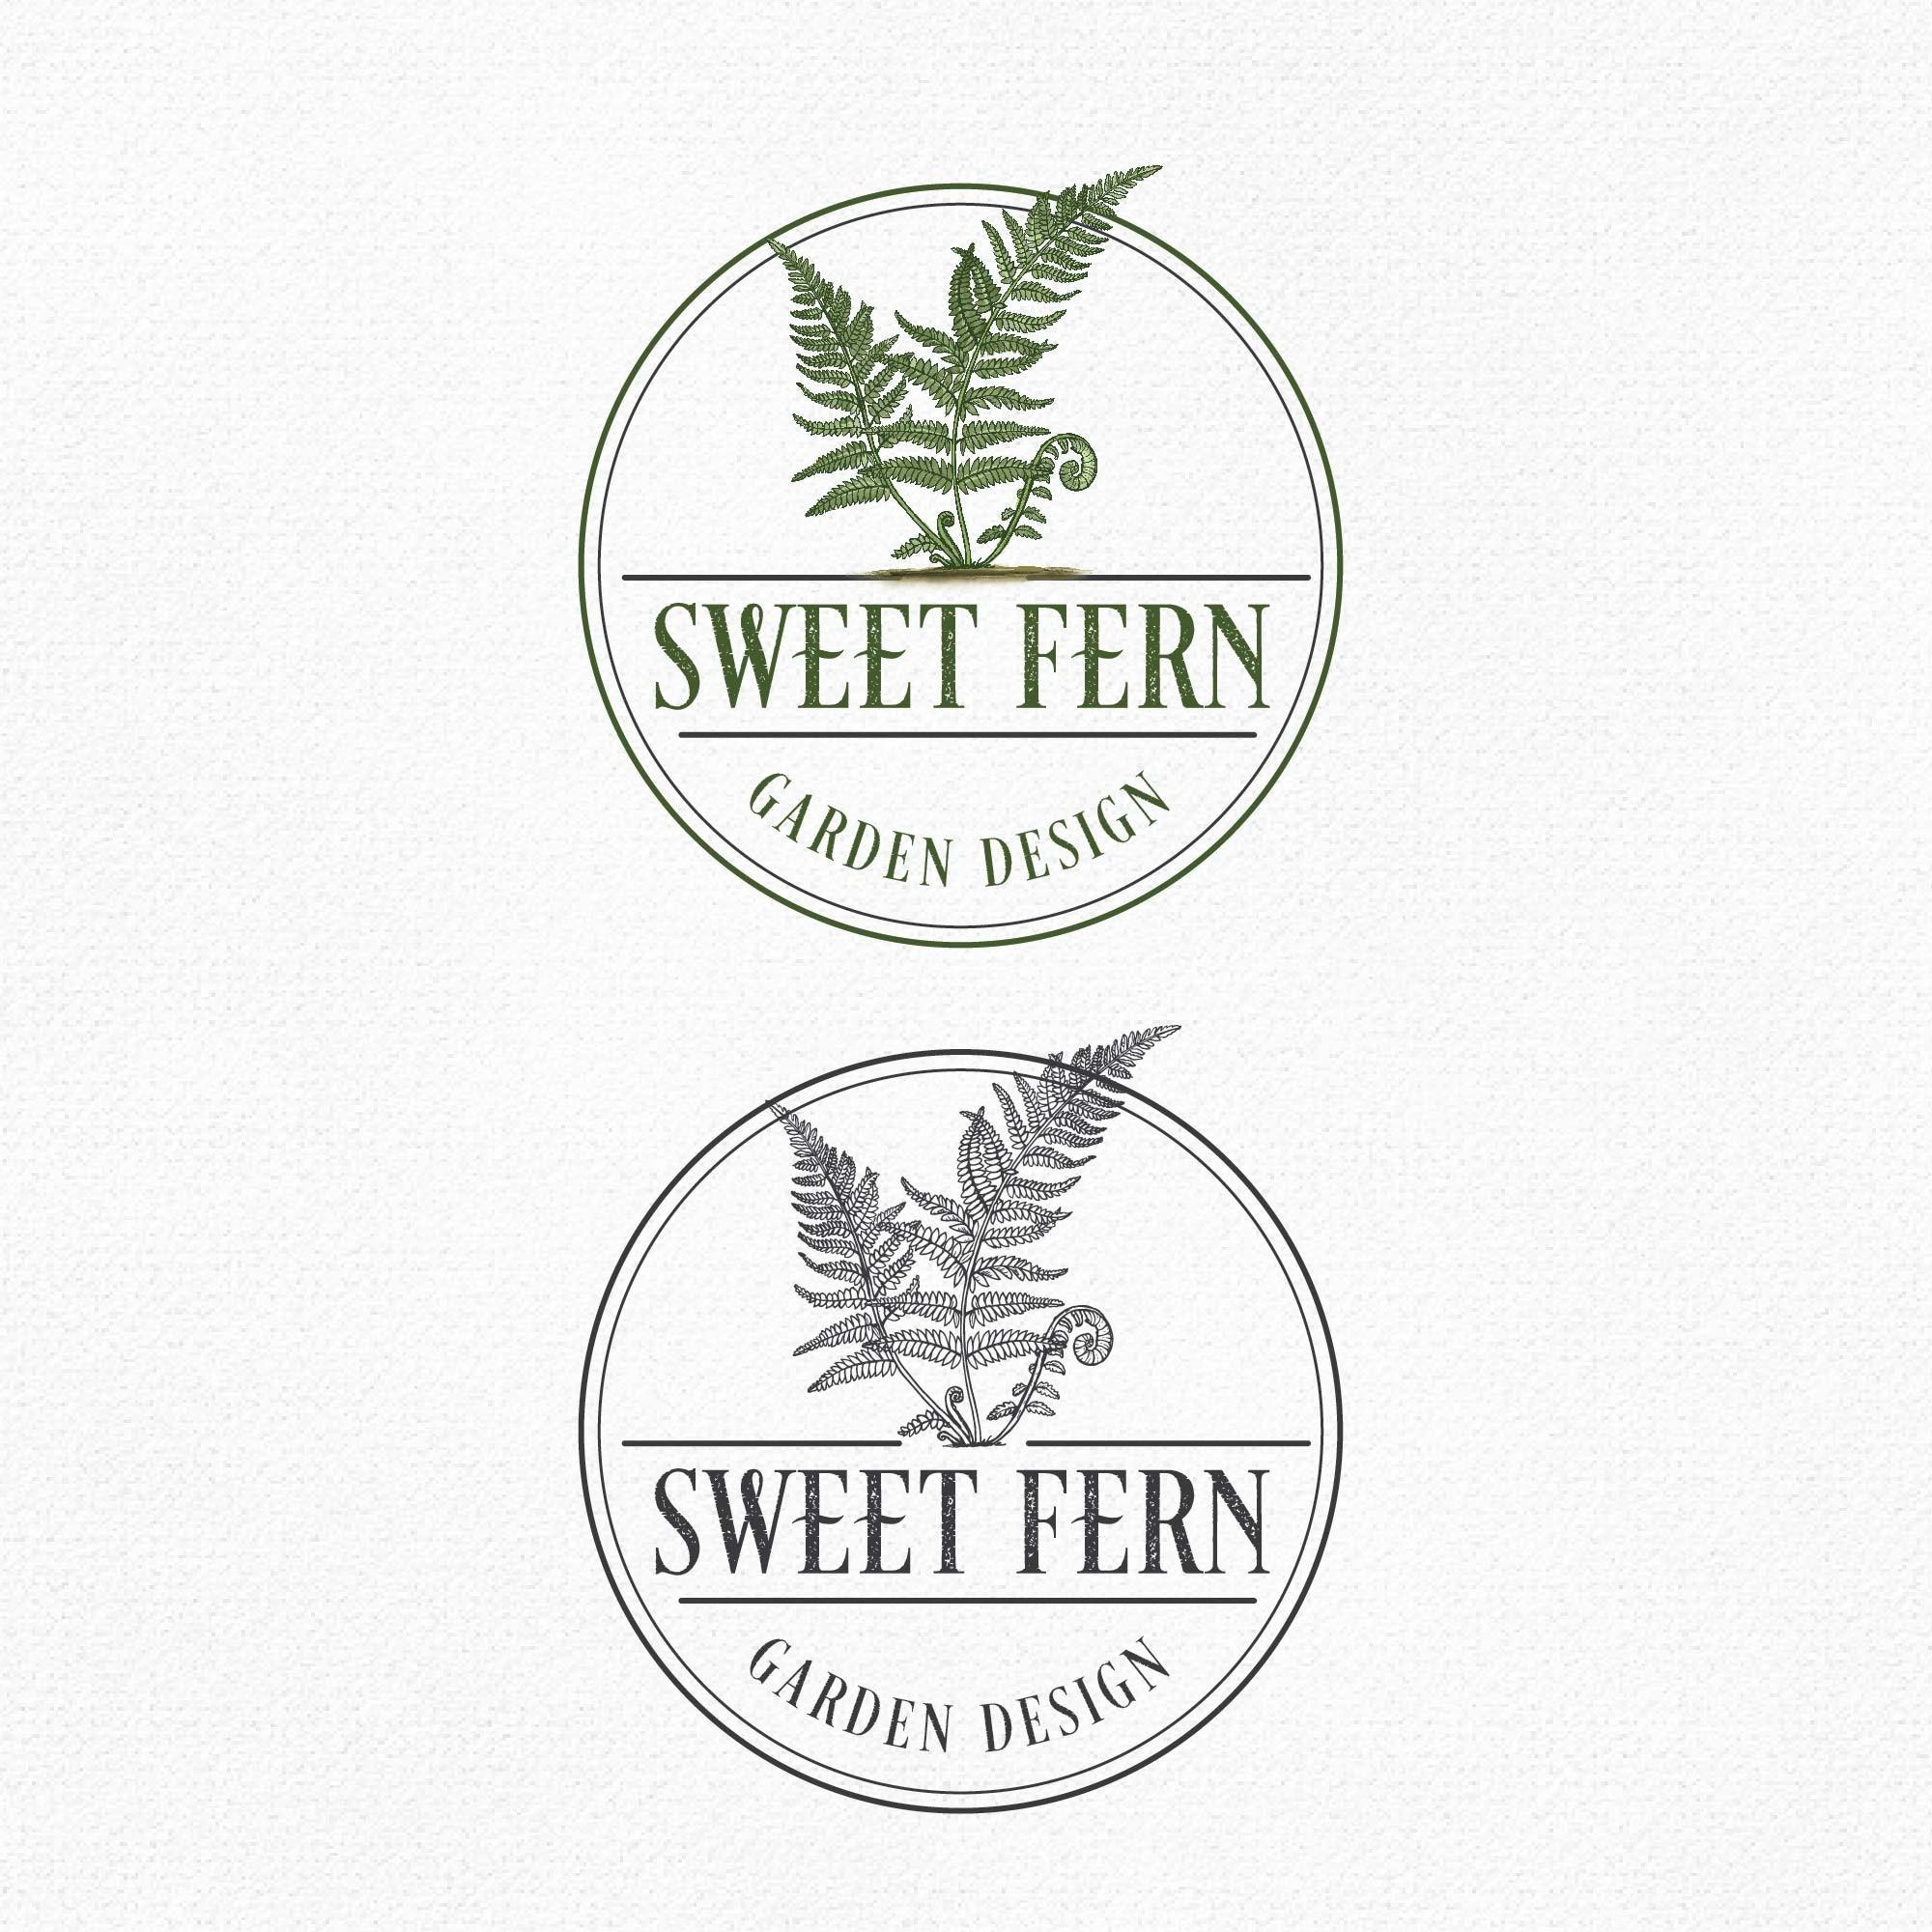 Sweet Fern Garden Design logo